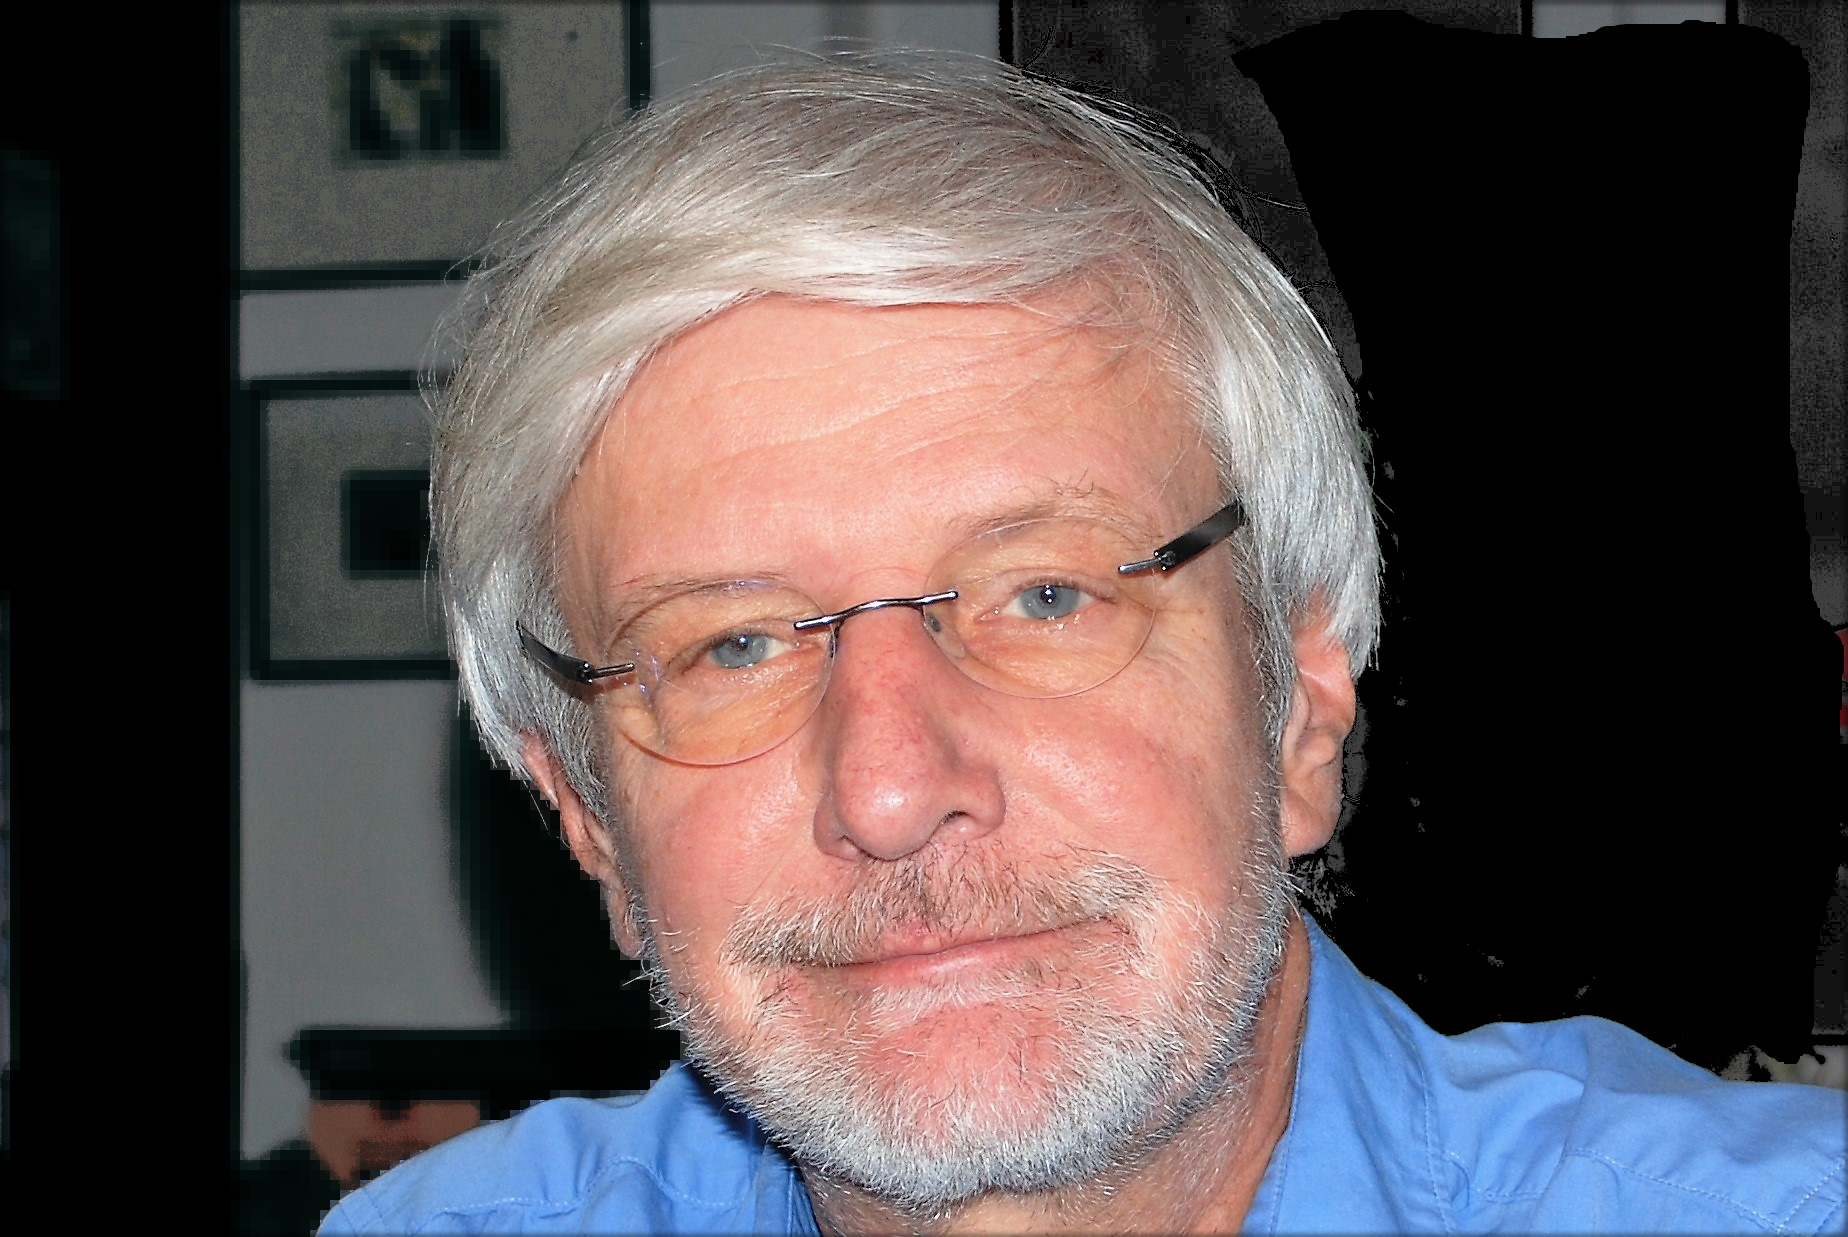 Prof. Dr. med., Dr. hc. Michael Sadre Chirazi-Stark